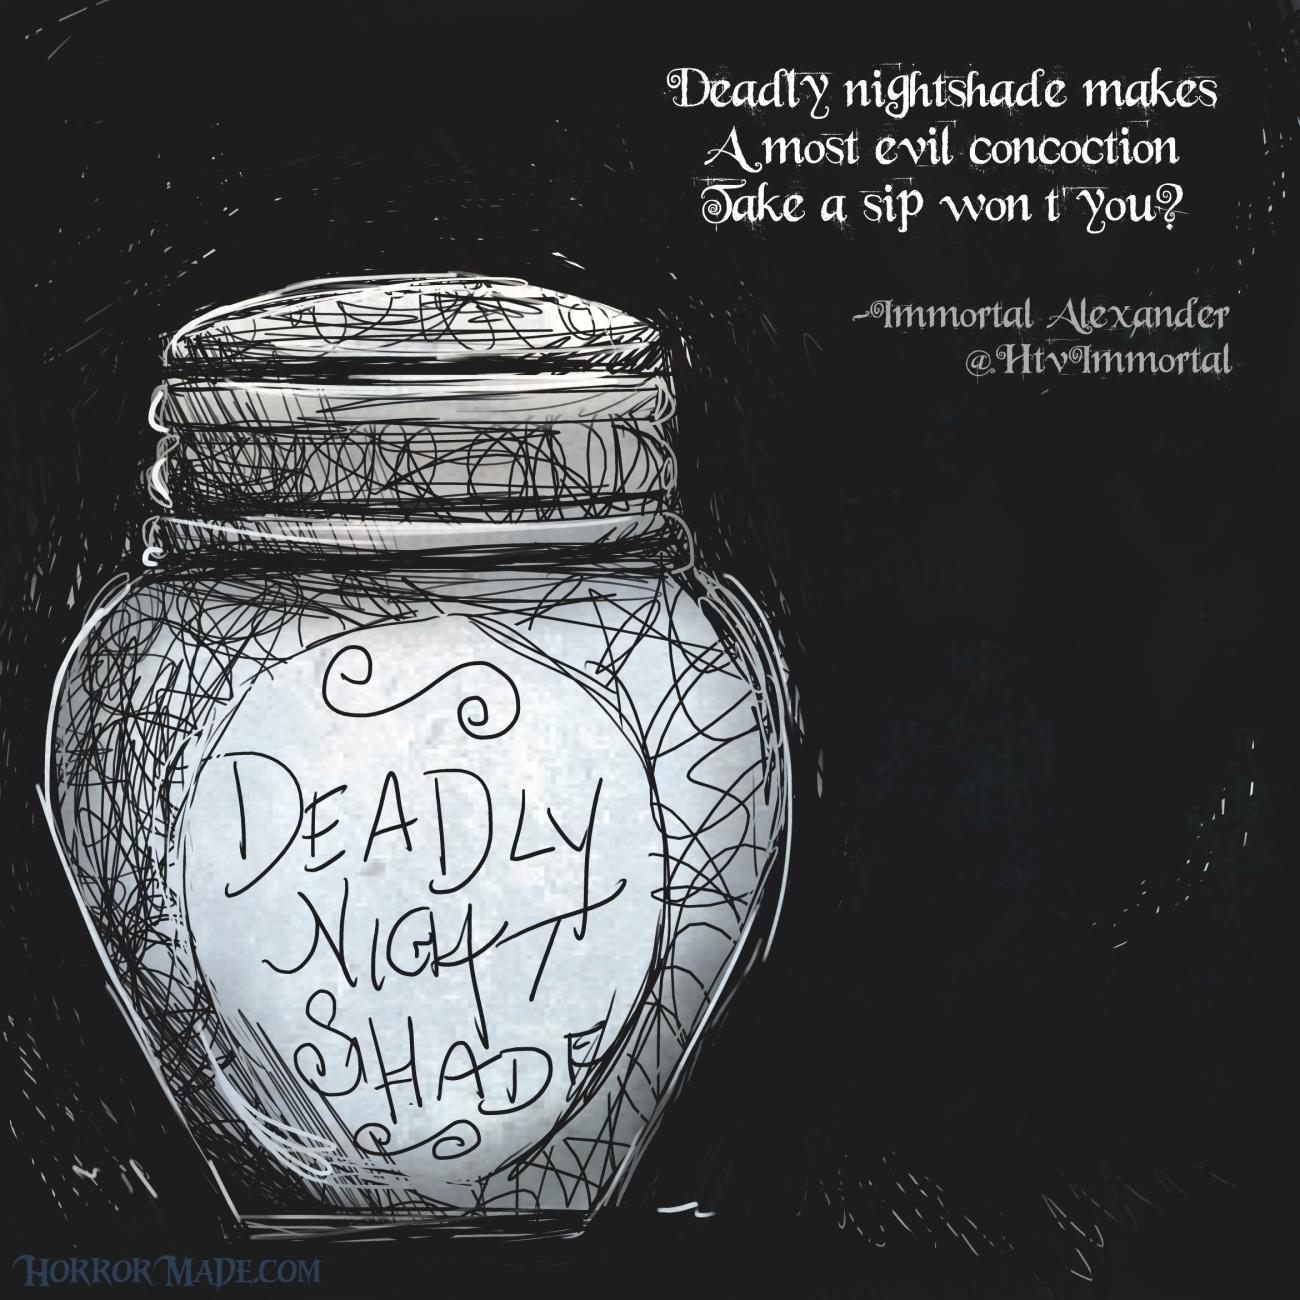 deadlynightshadesm